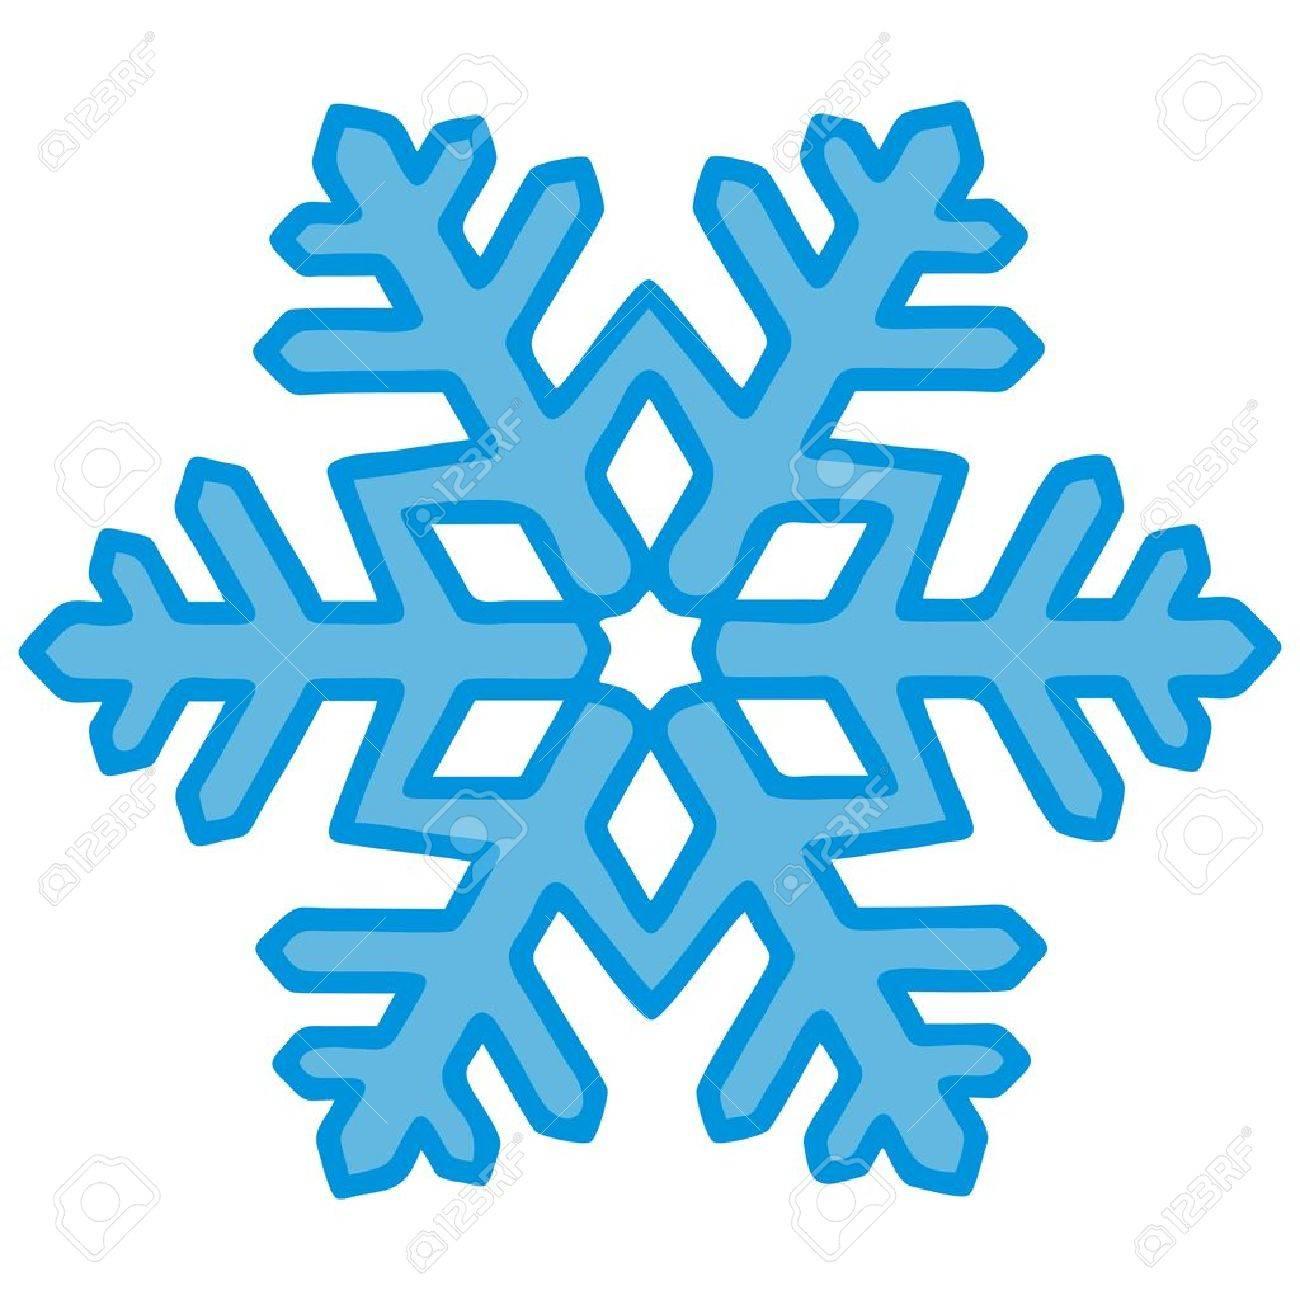 snowflake black contour royalty free cliparts vectors and stock rh 123rf com white snowflake vector art snowflake vector line art